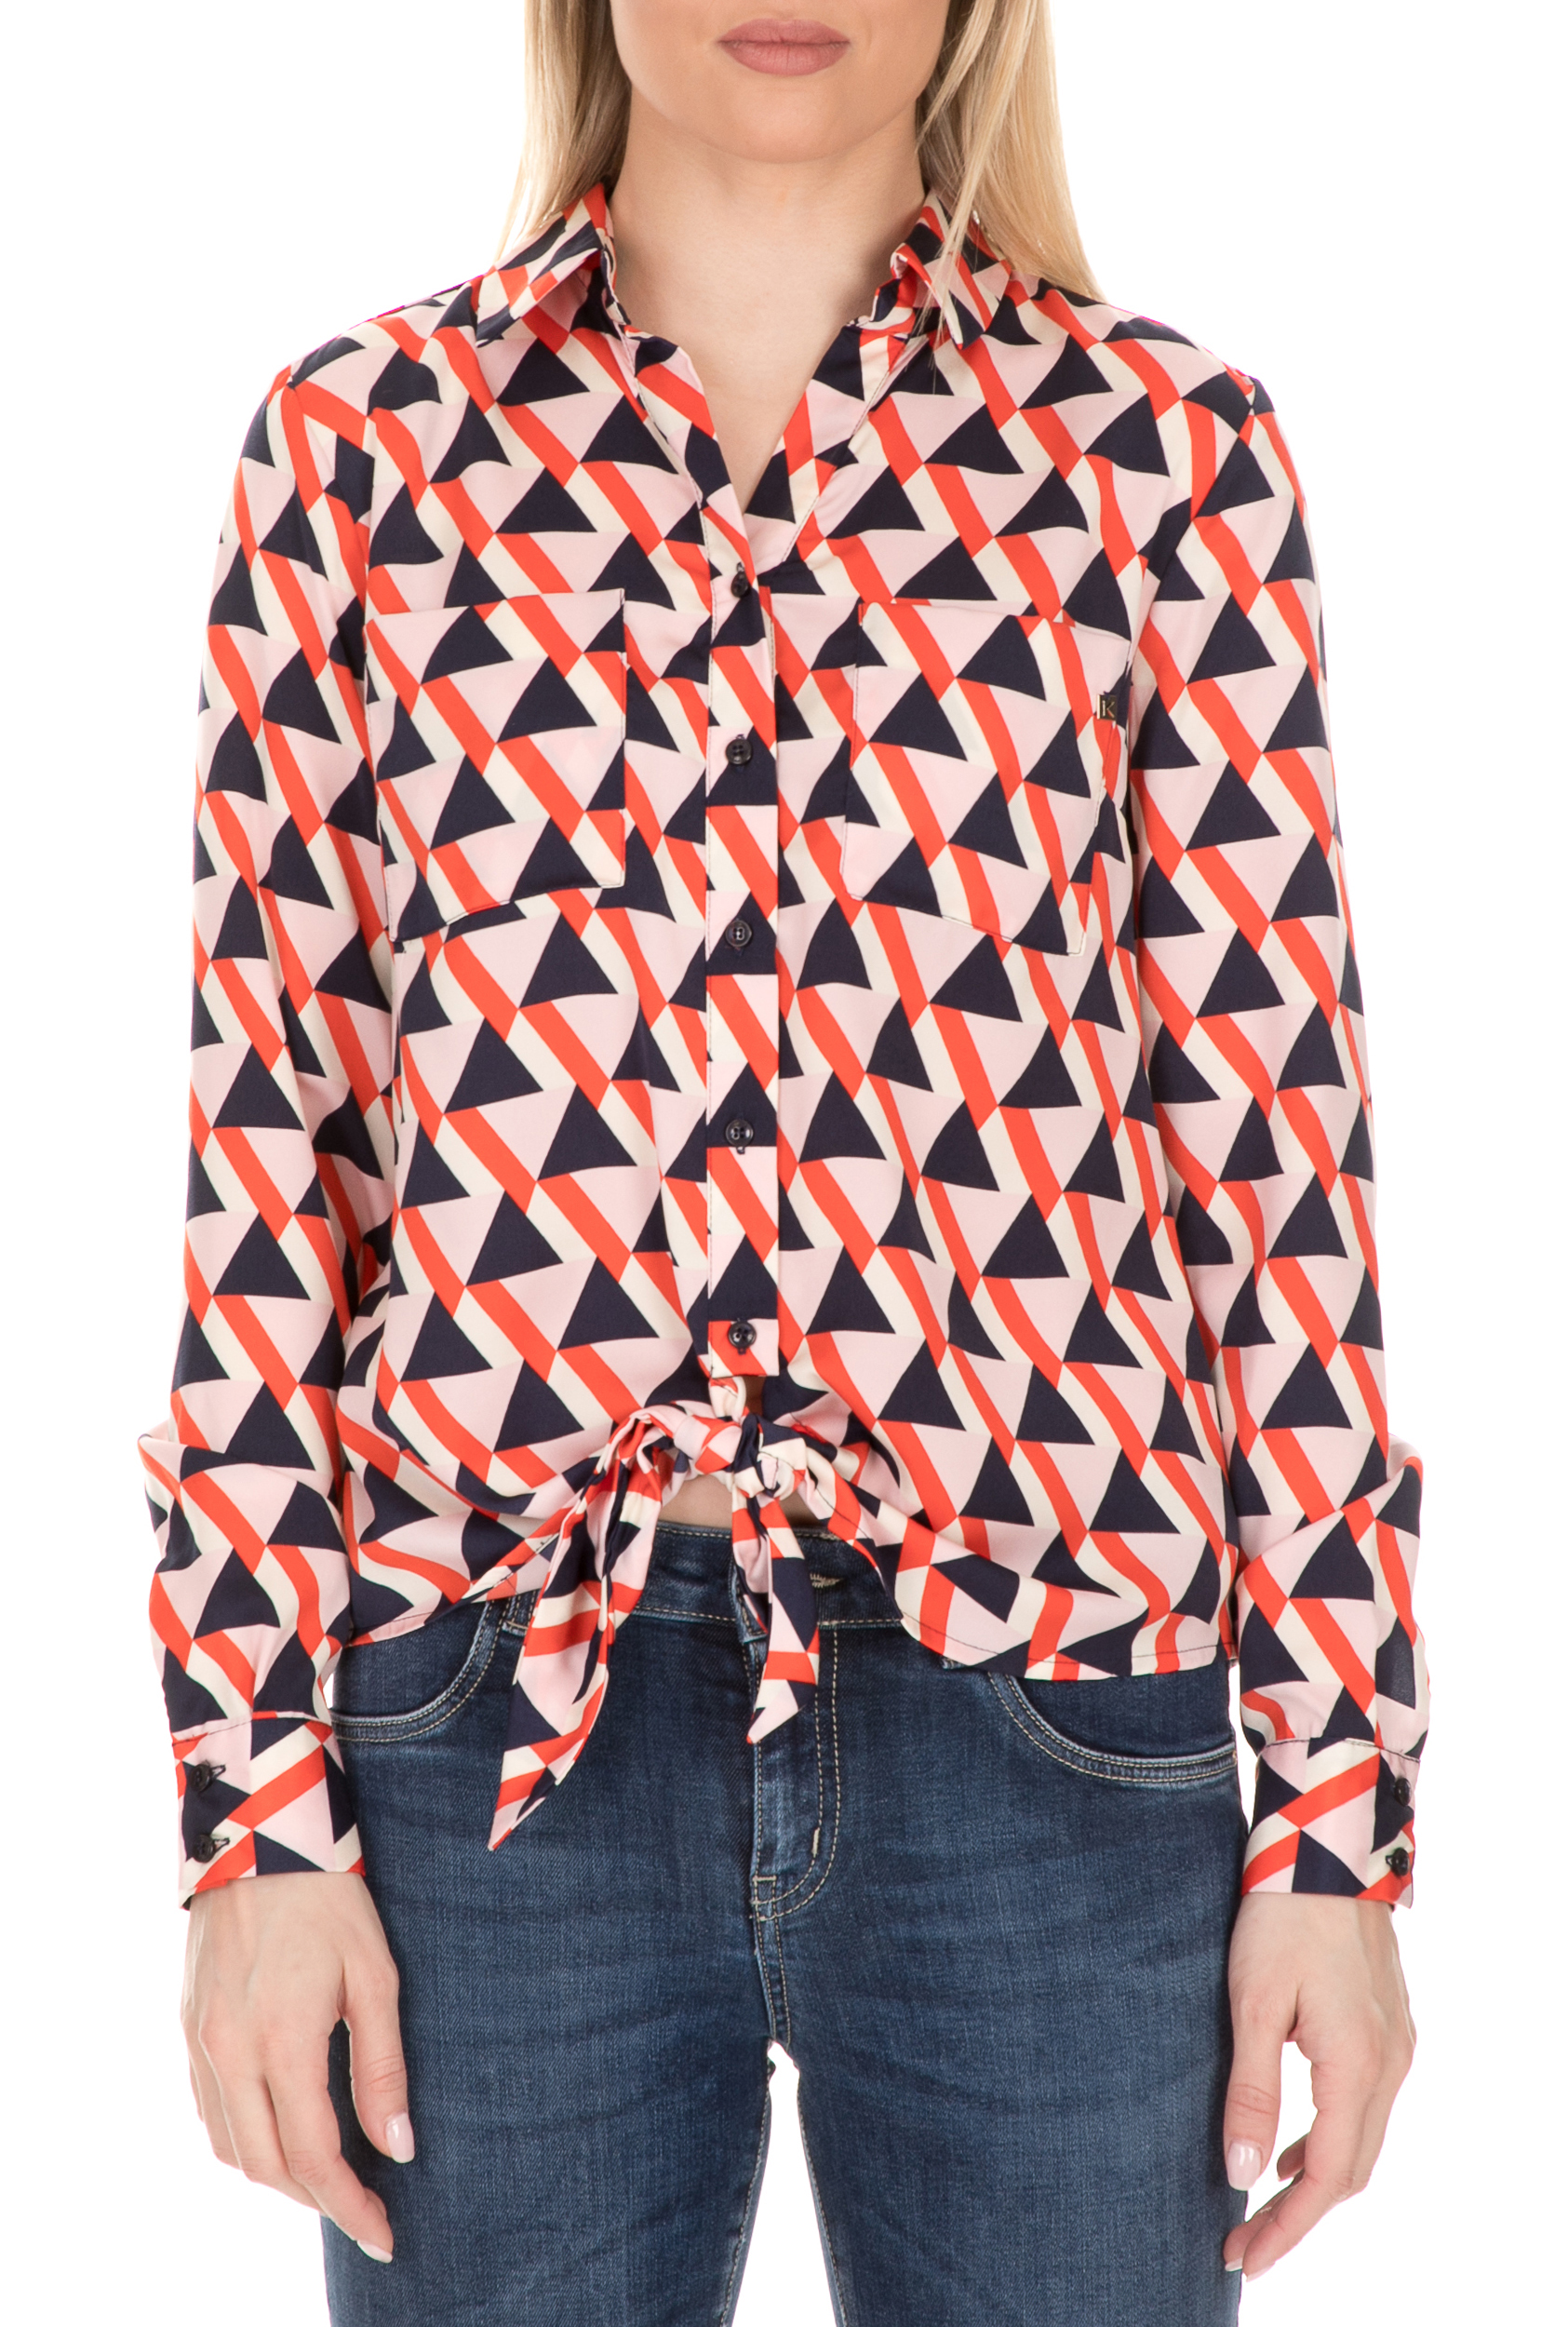 KOCCA - Γυναικείο πουκάμισο KOCCA VOLY με μοτίβο γυναικεία ρούχα πουκάμισα μακρυμάνικα